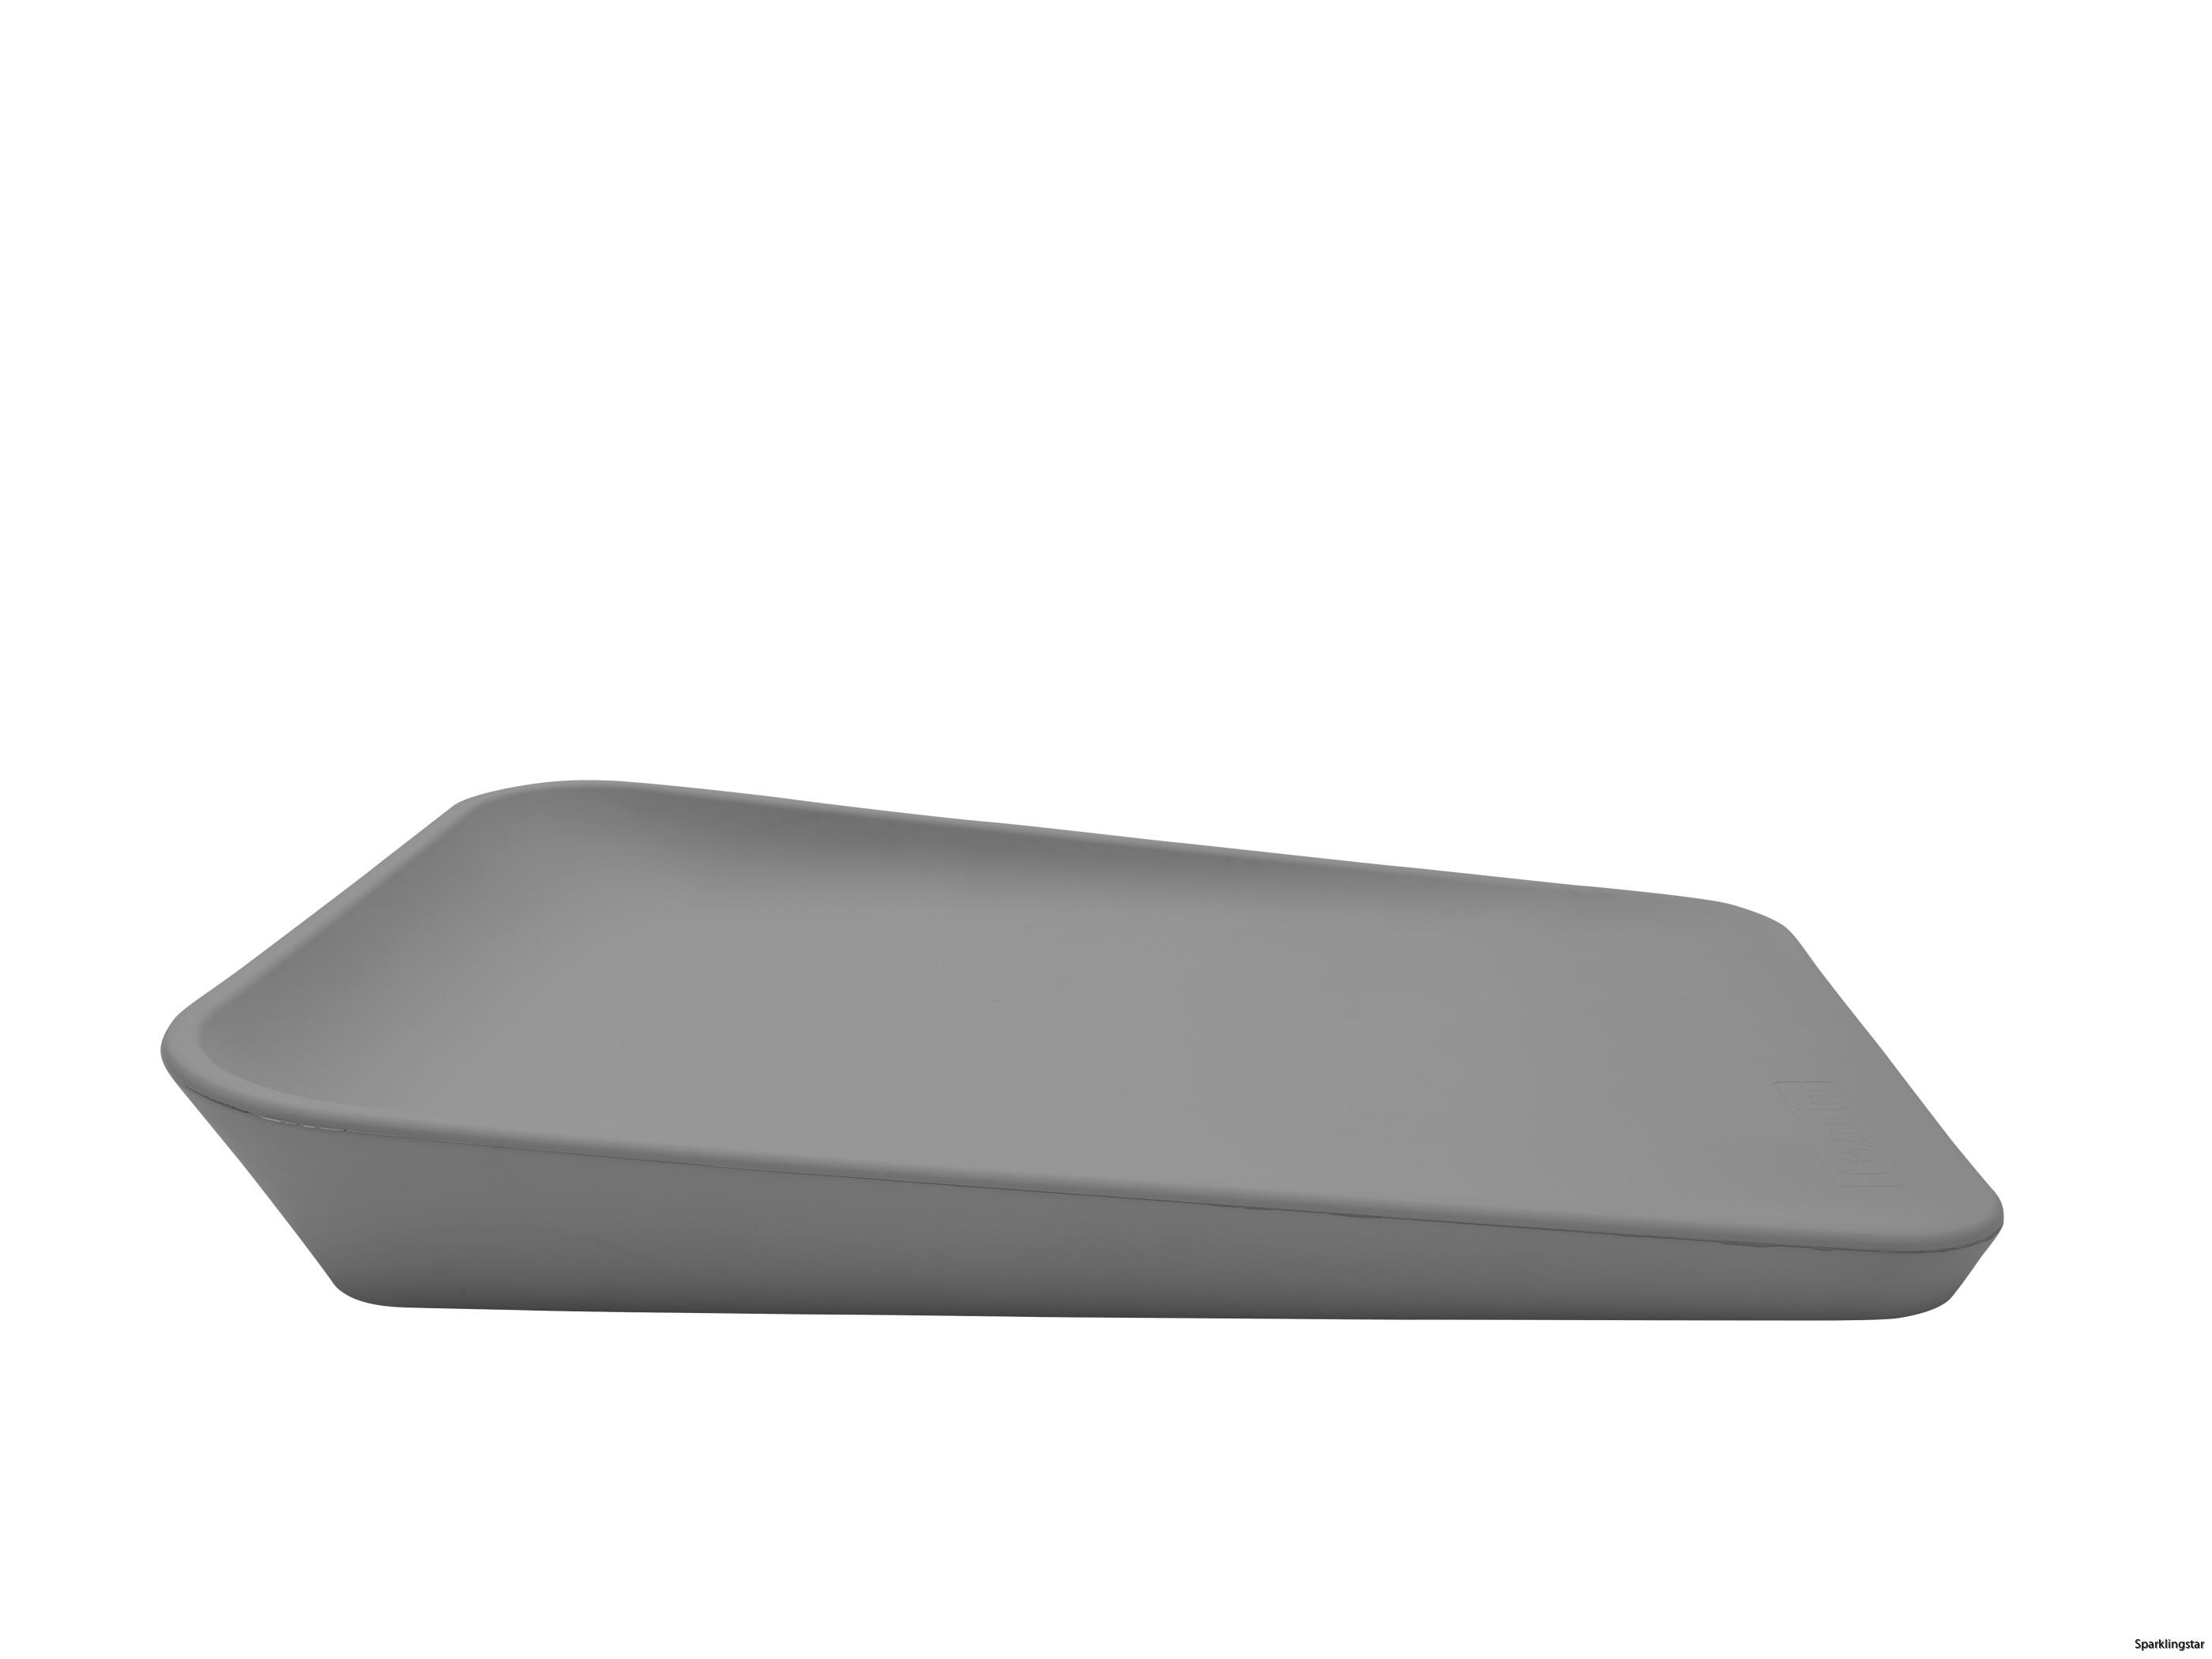 leander-matty3-510010-72